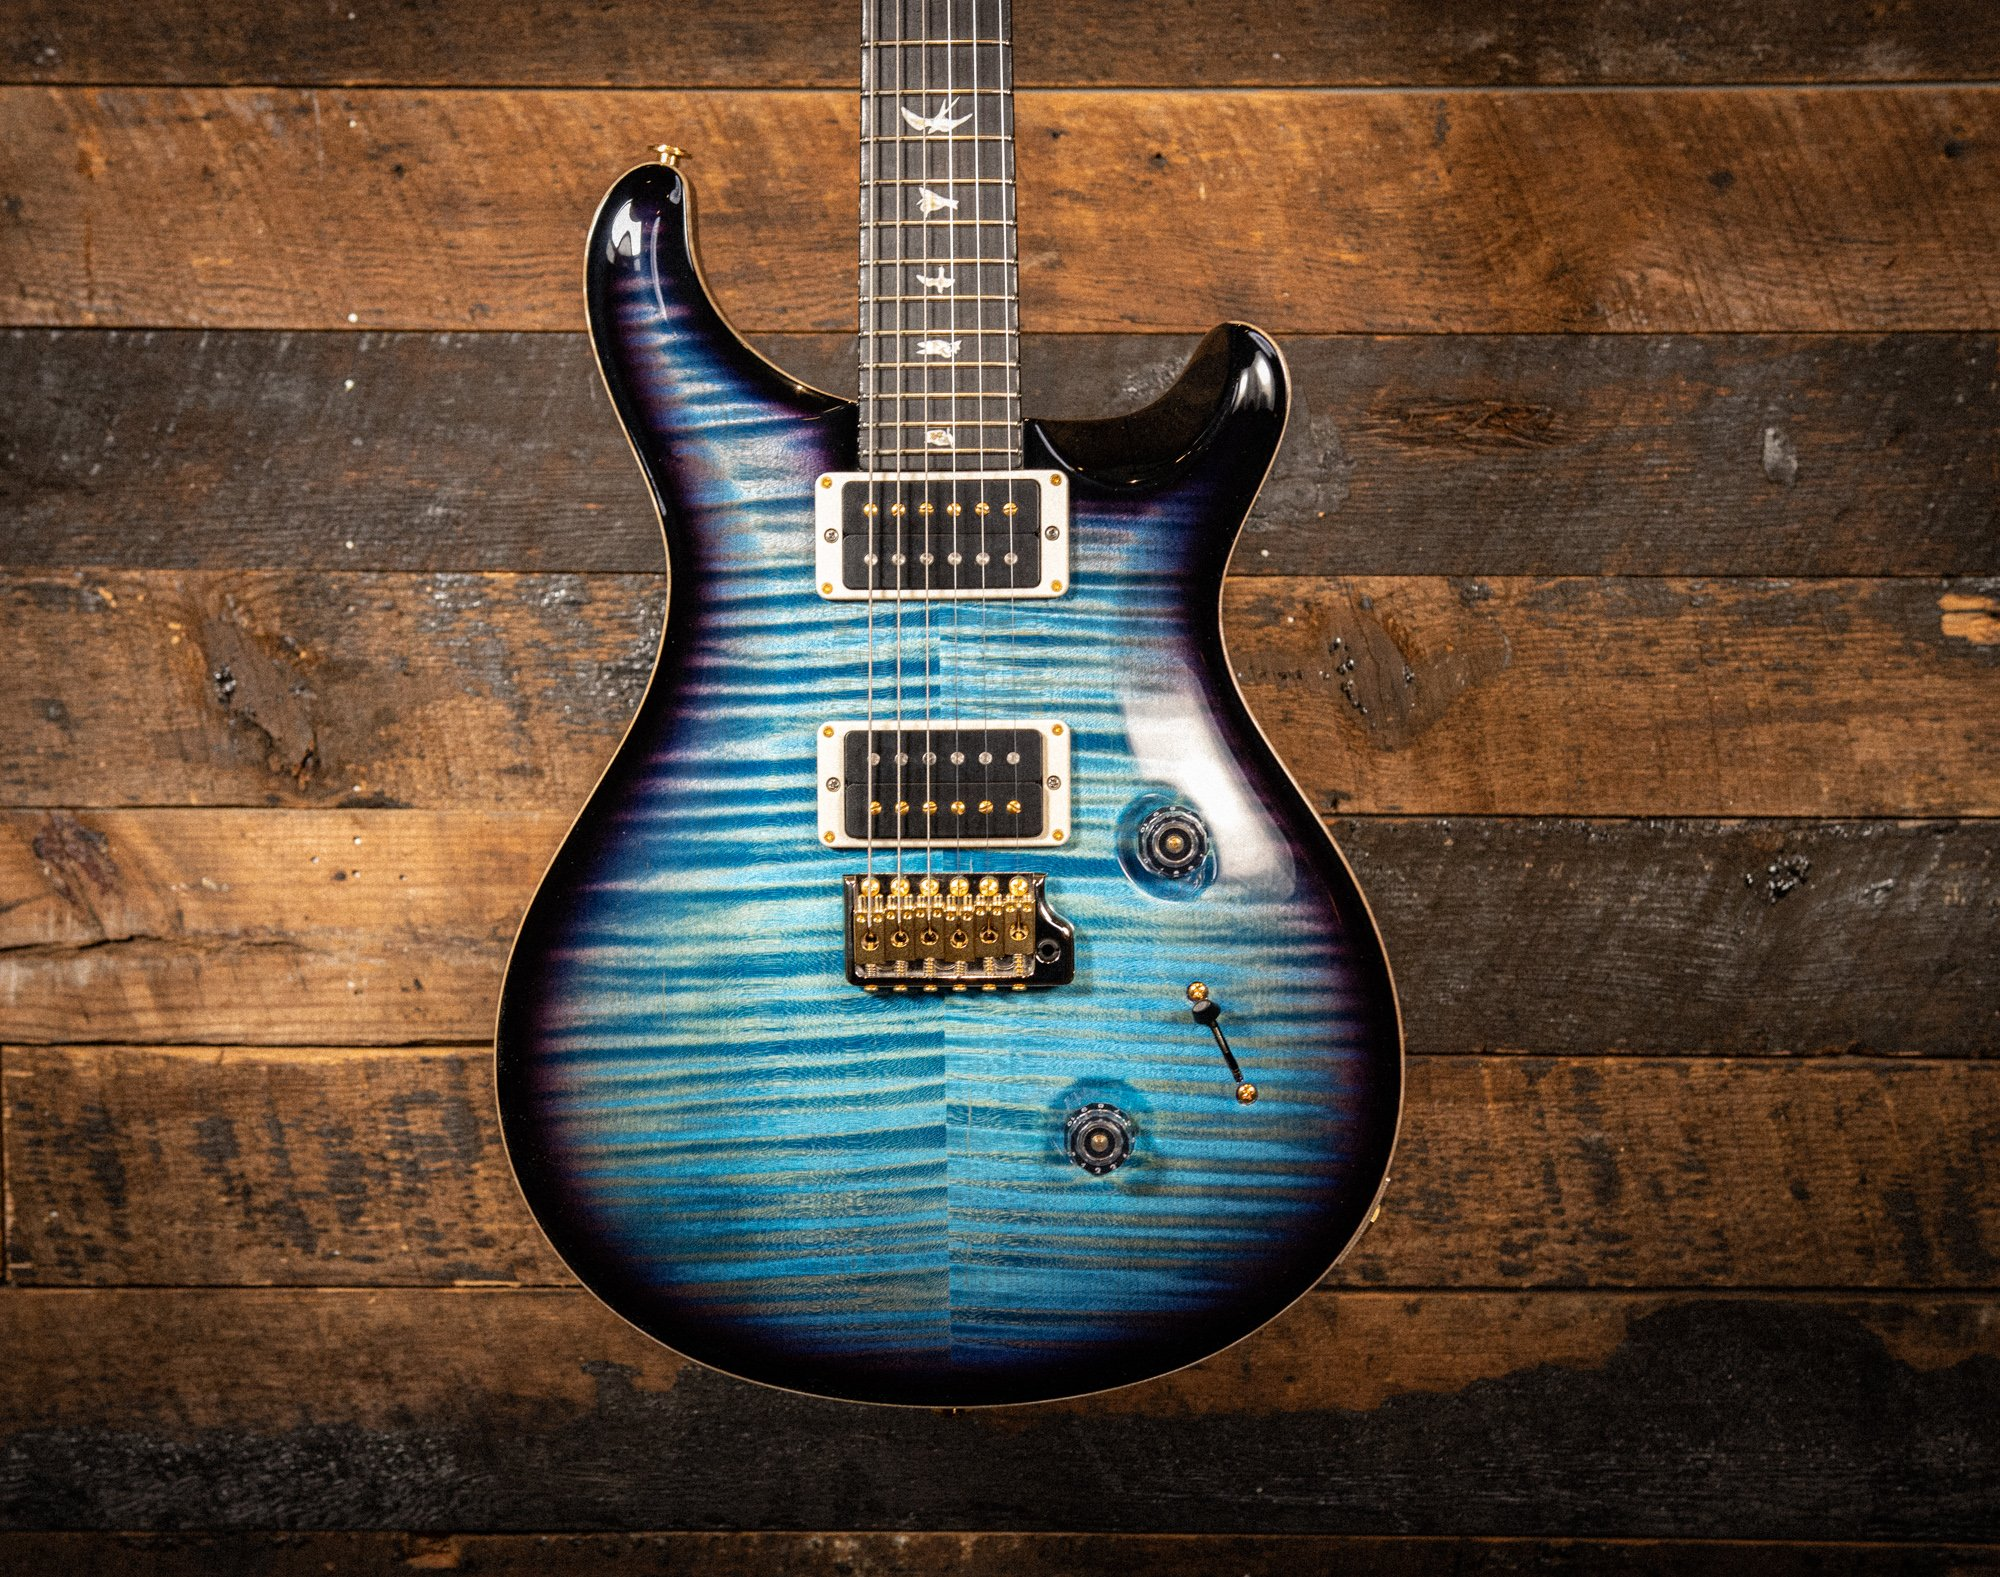 PRS Custom 24 in Aqua Blue Smokeburst